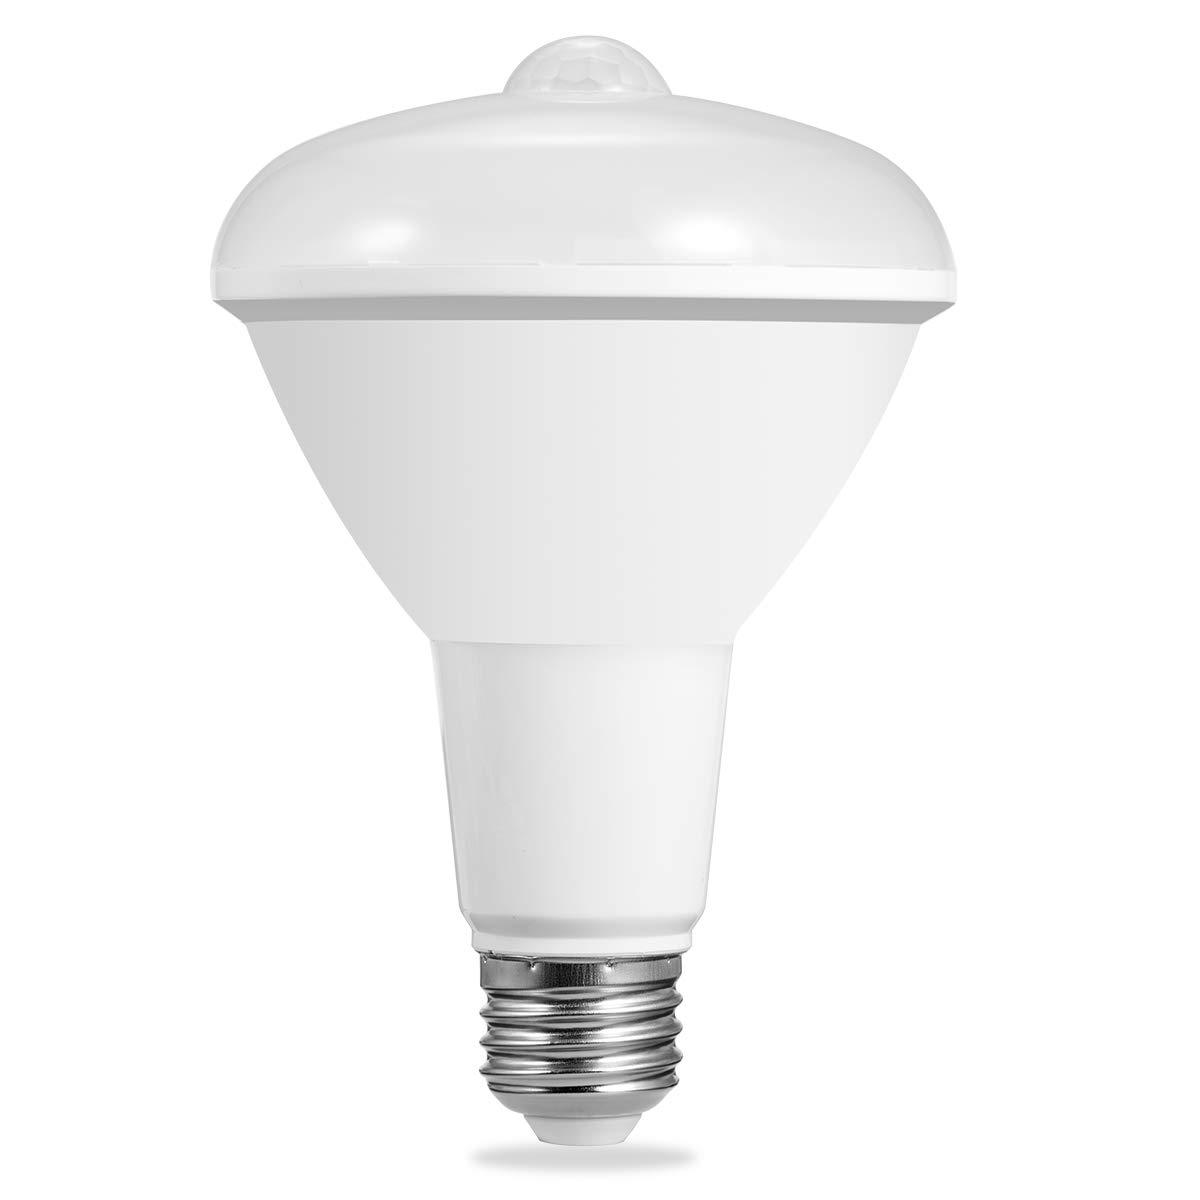 LOHAS BR30 LED Bulb with Motion Sensor Light, 100W Light Bulbs Equivalent(12W), Security Light Outdoor Floodlight, Daylight 5000K E26 Medium Base, Motion Activated LED Bulbs for Garage Porch(1 Pack)